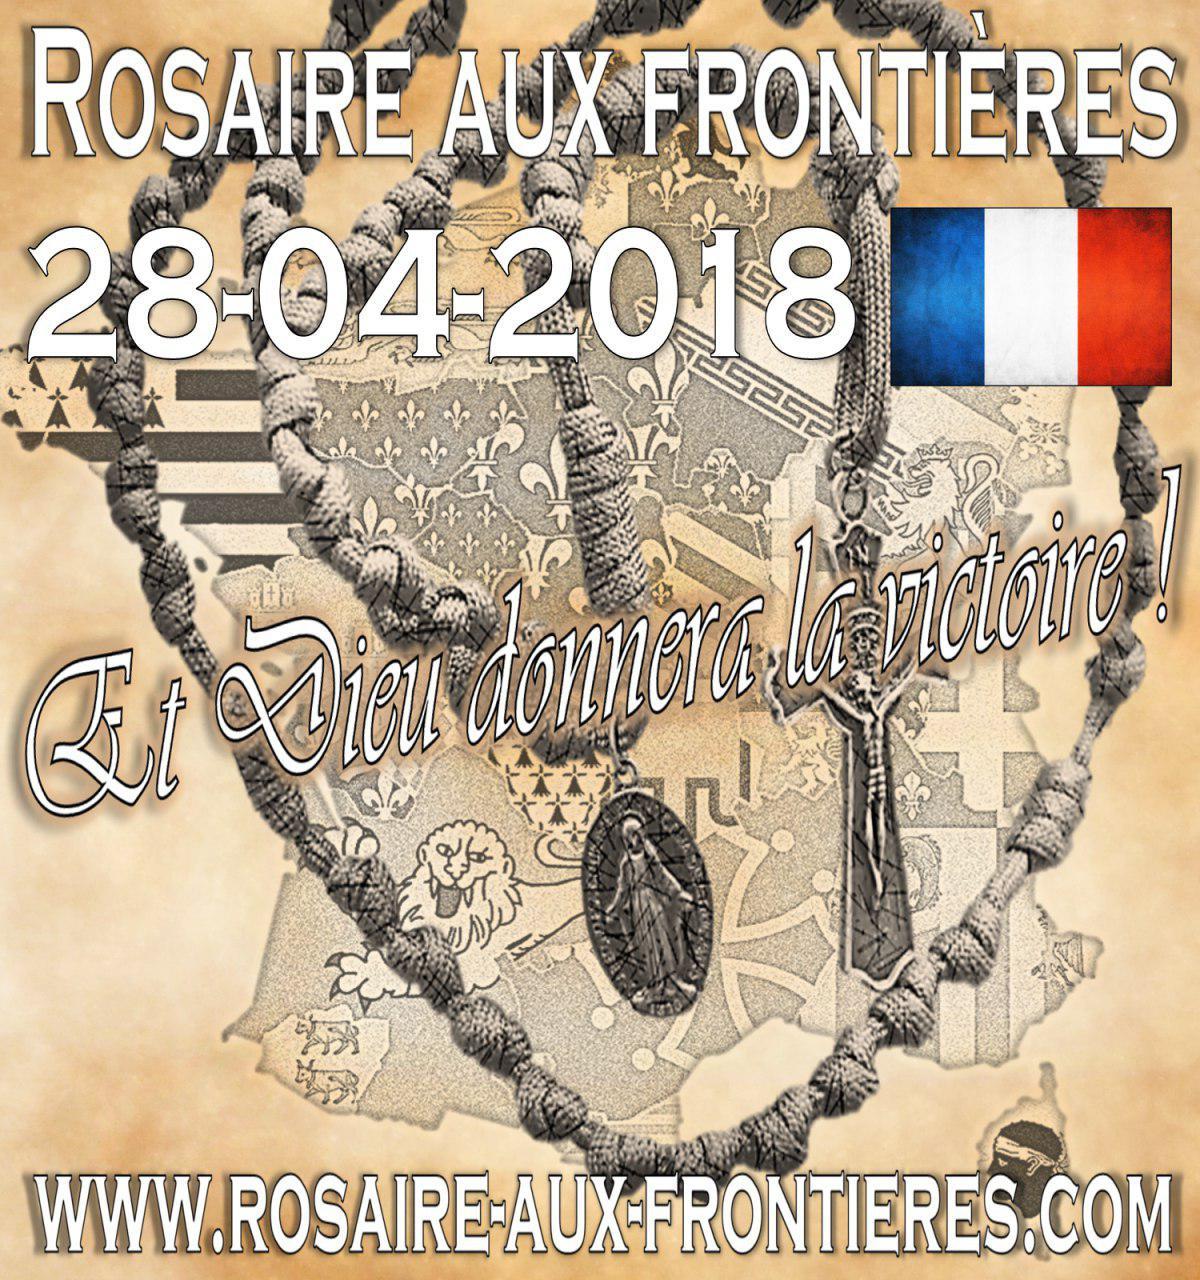 http://media.medias-presse.info/wp-content/uploads/2018/04/rosaire-aux-frontieres-france.jpg